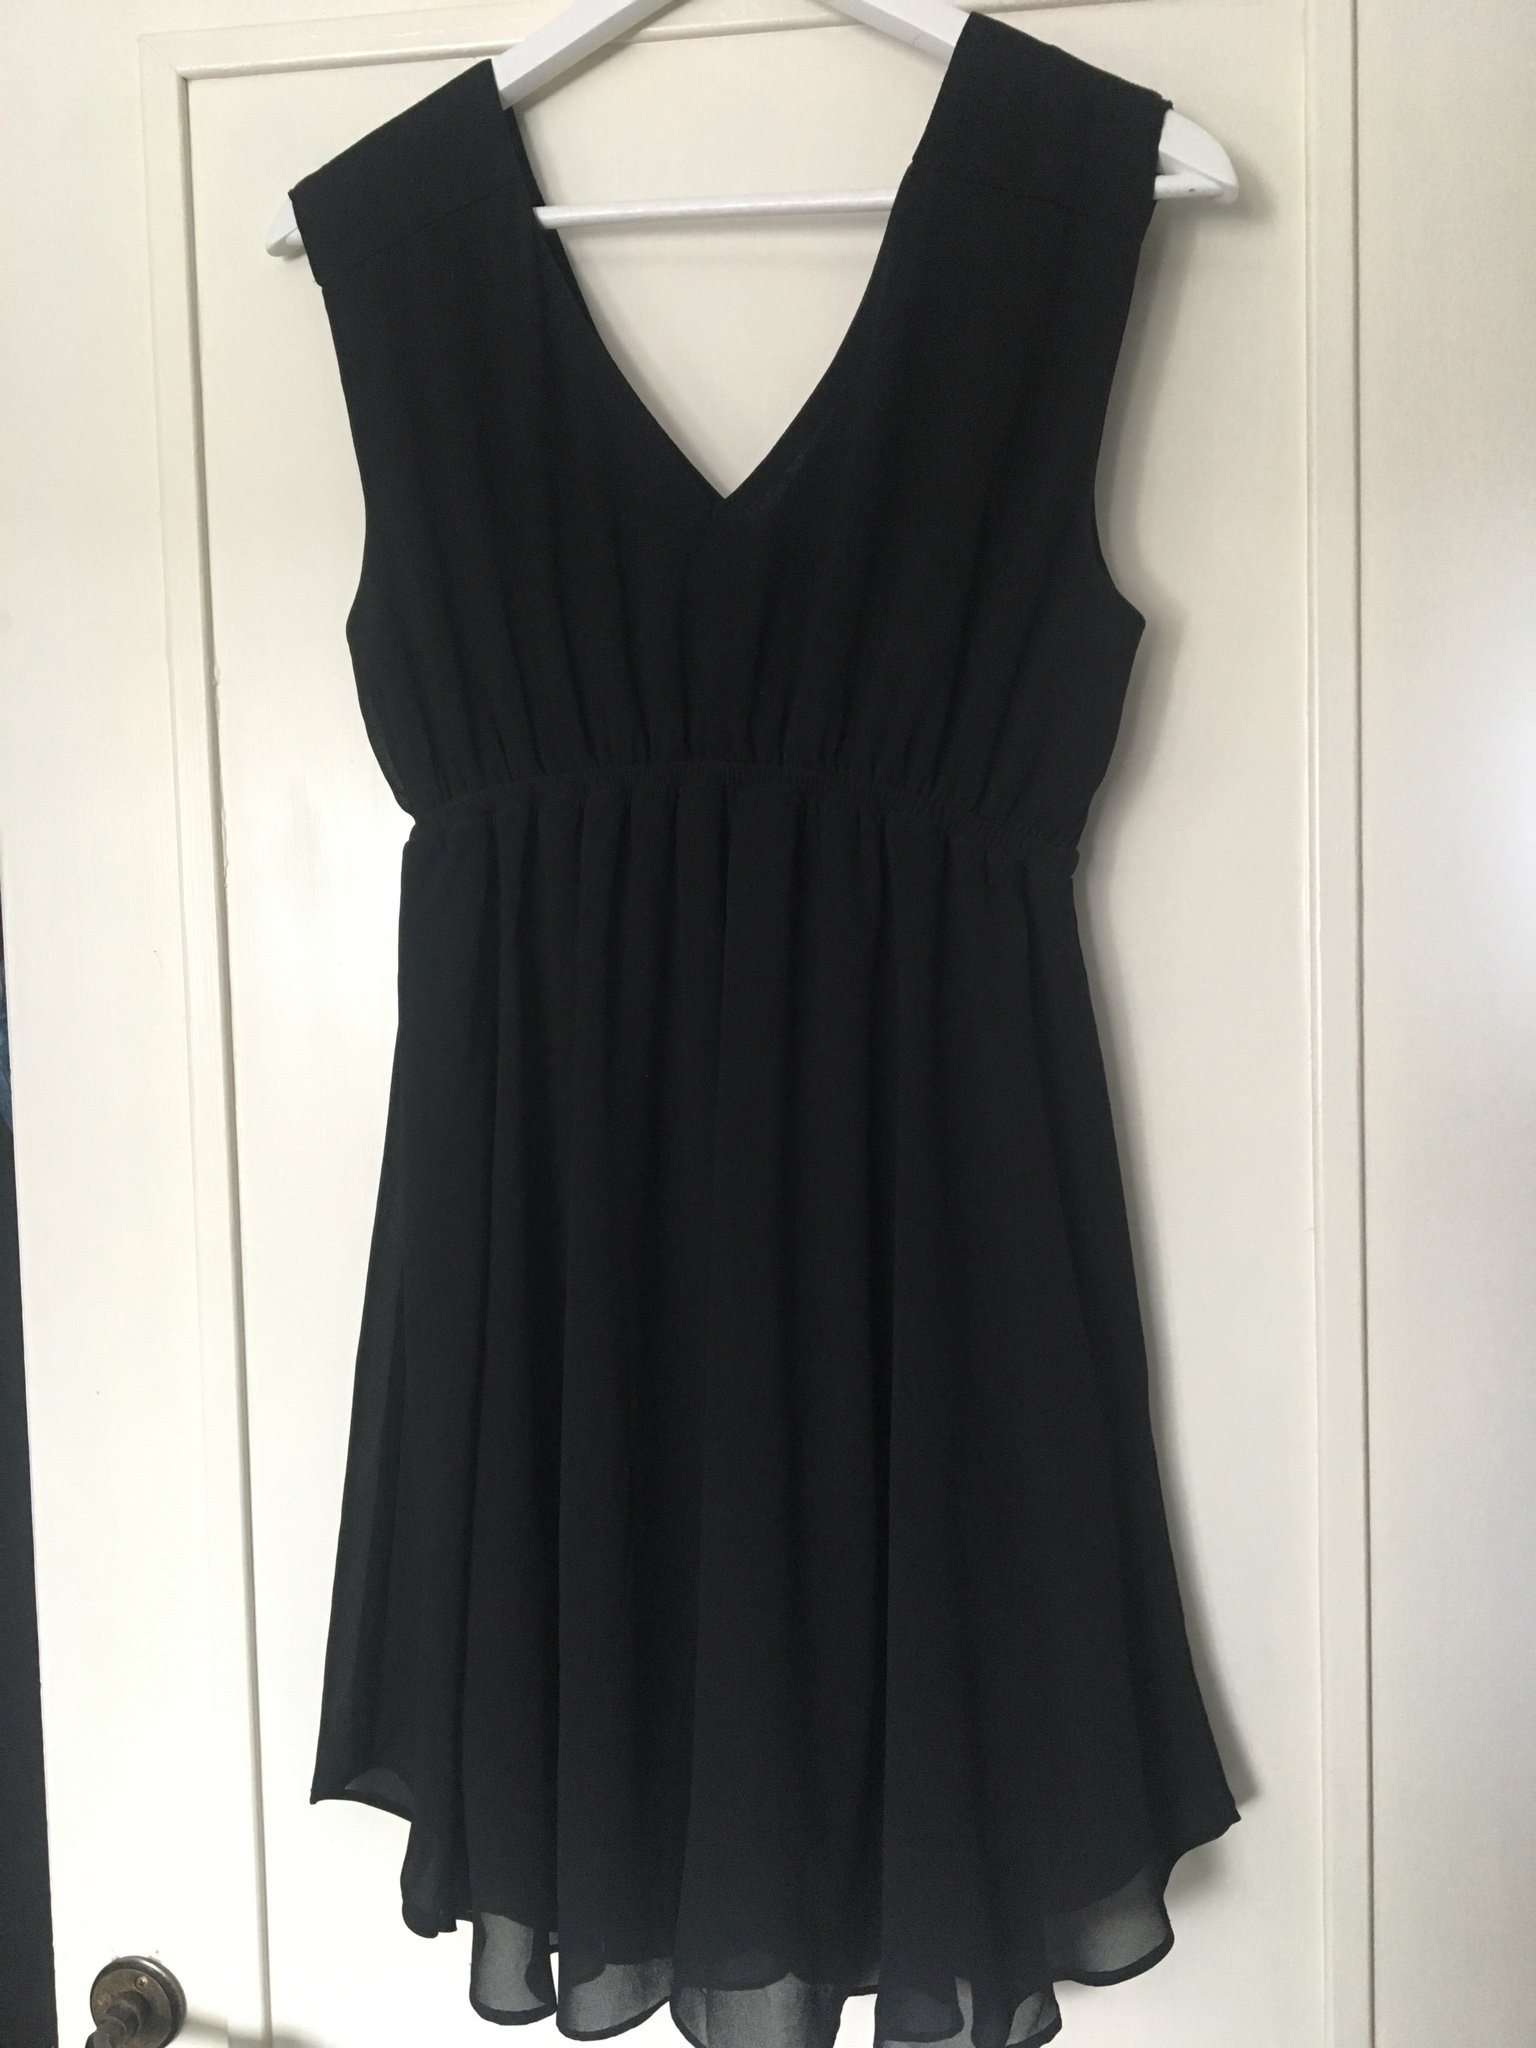 2f1748e1c2ba Vila klänning strl S (343575612) ᐈ Köp på Tradera